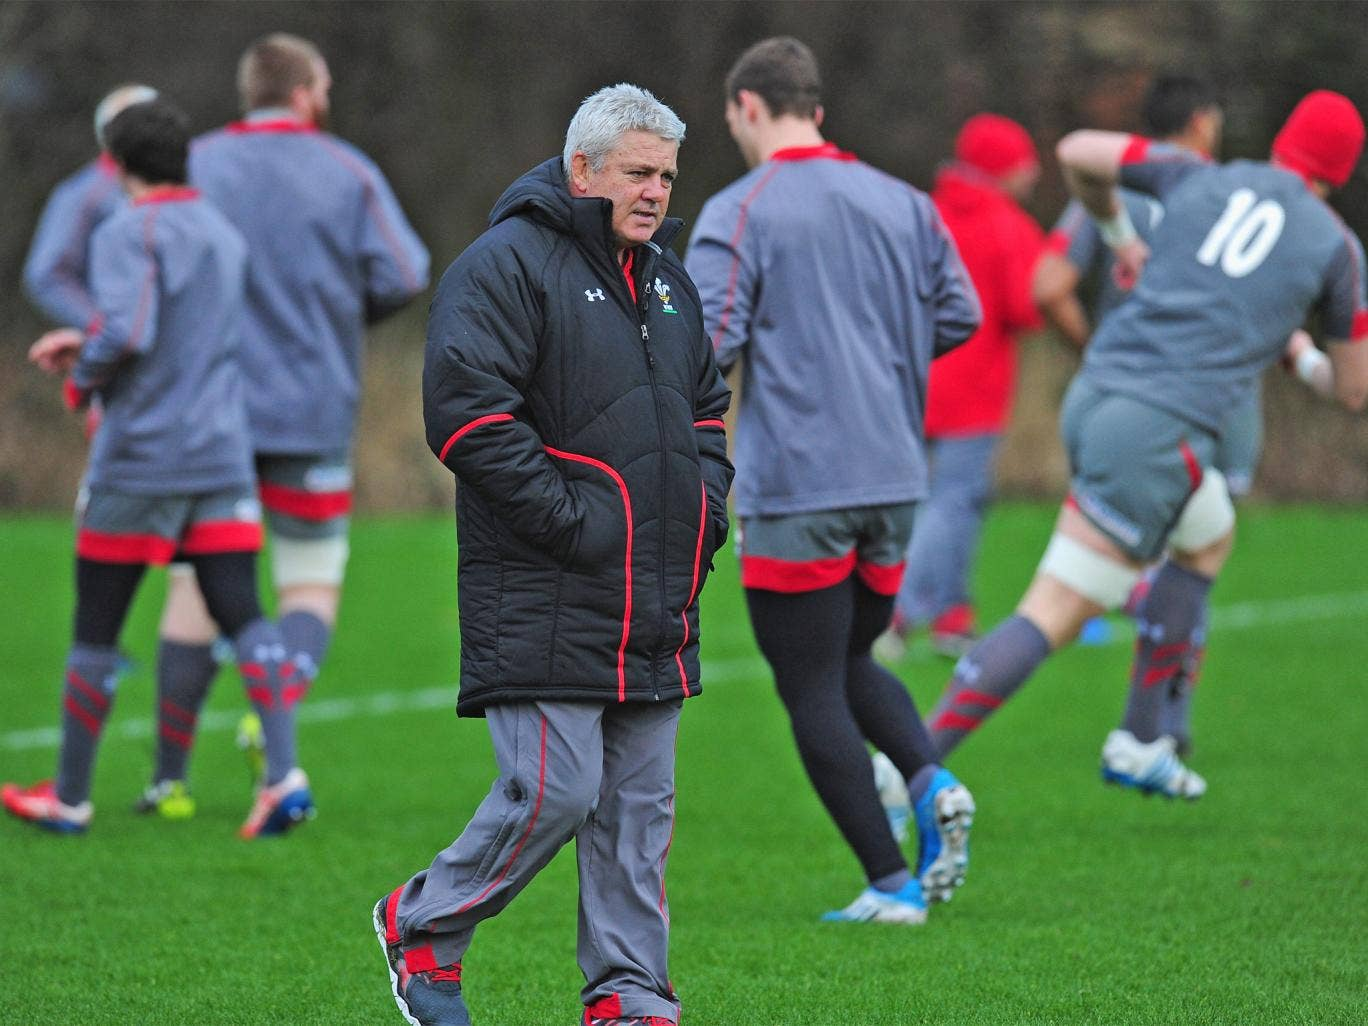 Wales coach Warren Gatland oversees training